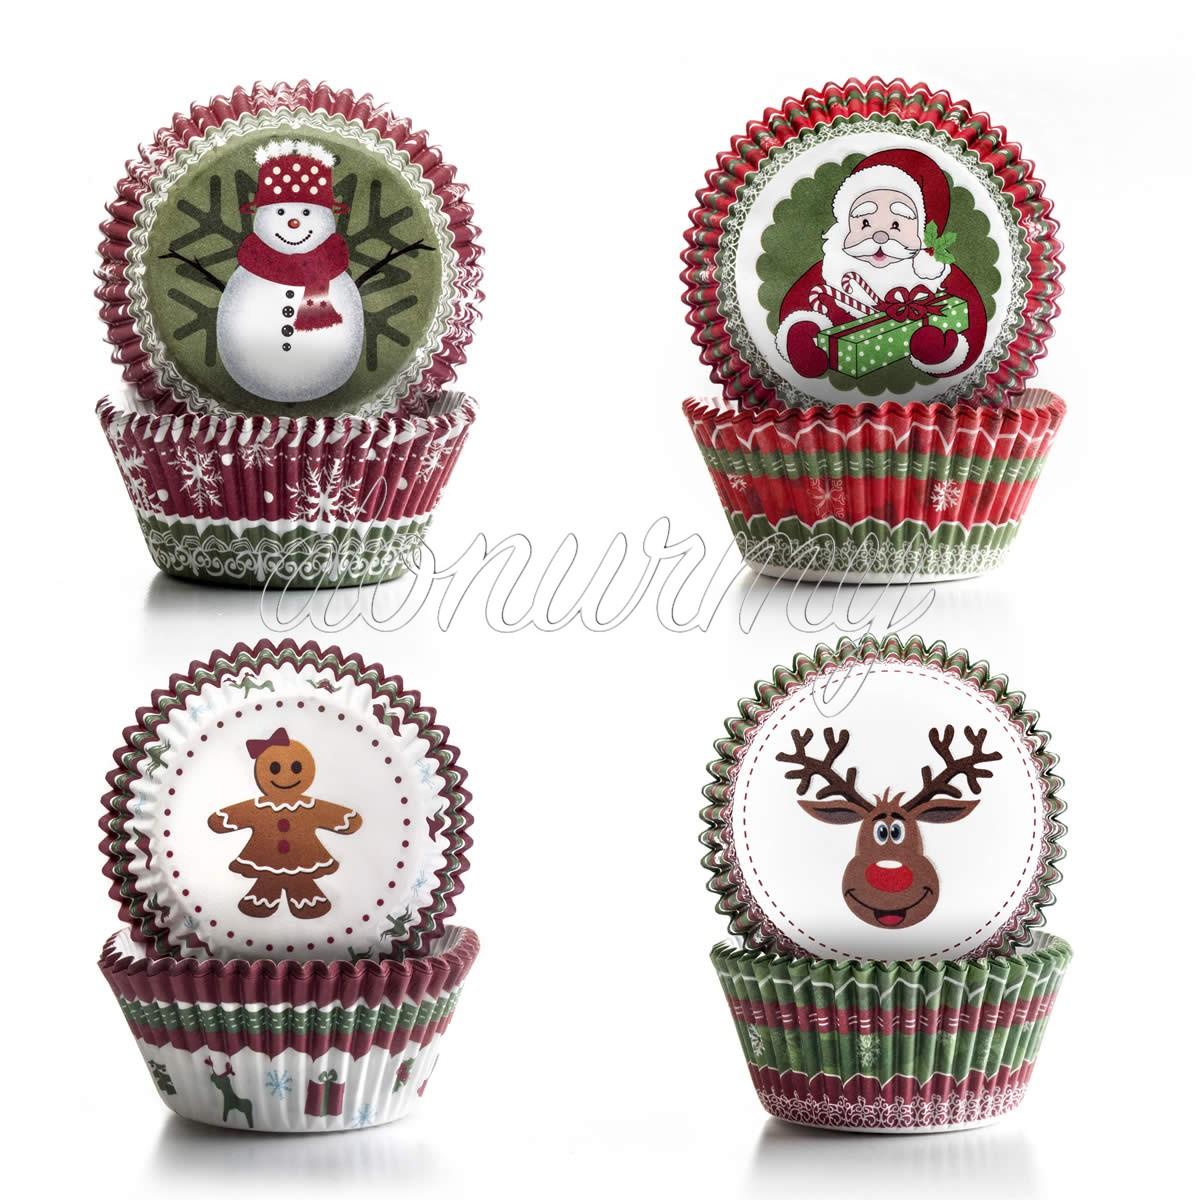 Cápsulas Repostería de dulces de Navidad Ibili